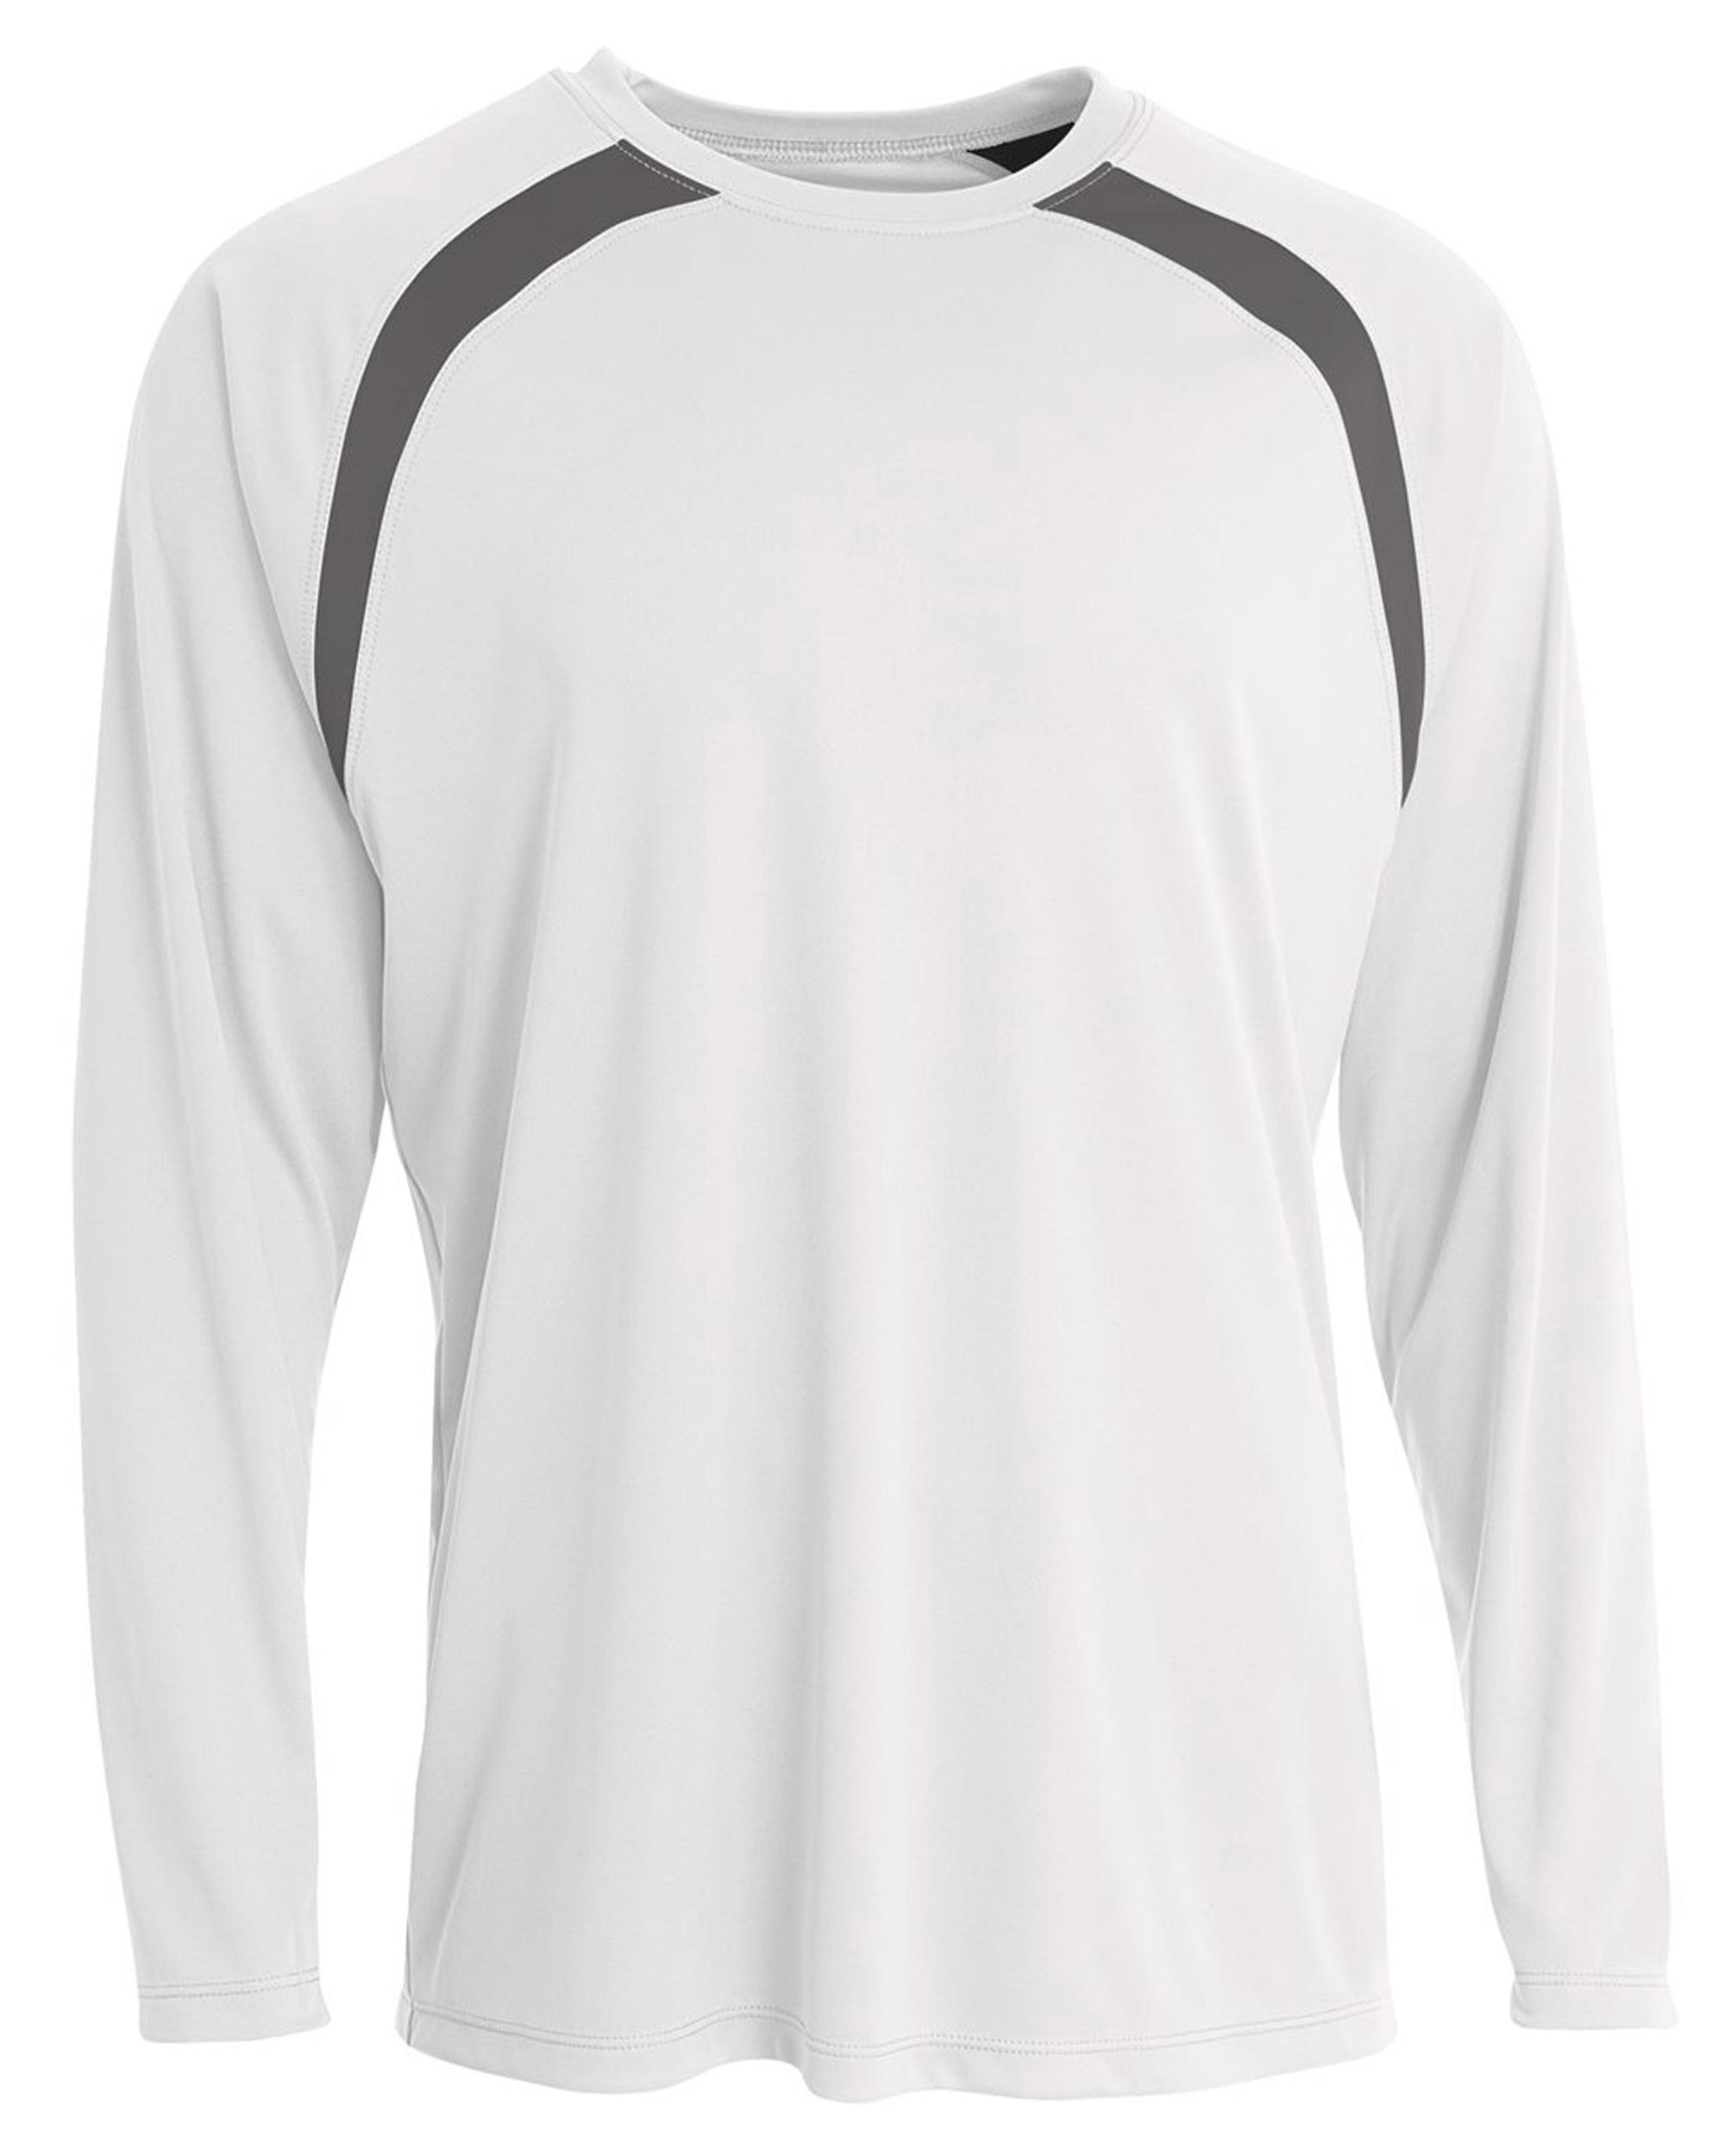 Men-039-s-Long-Sleeve-Loose-Fit-Rash-Guard-Surf-Shirt-Water-Sports-Swimwear thumbnail 27